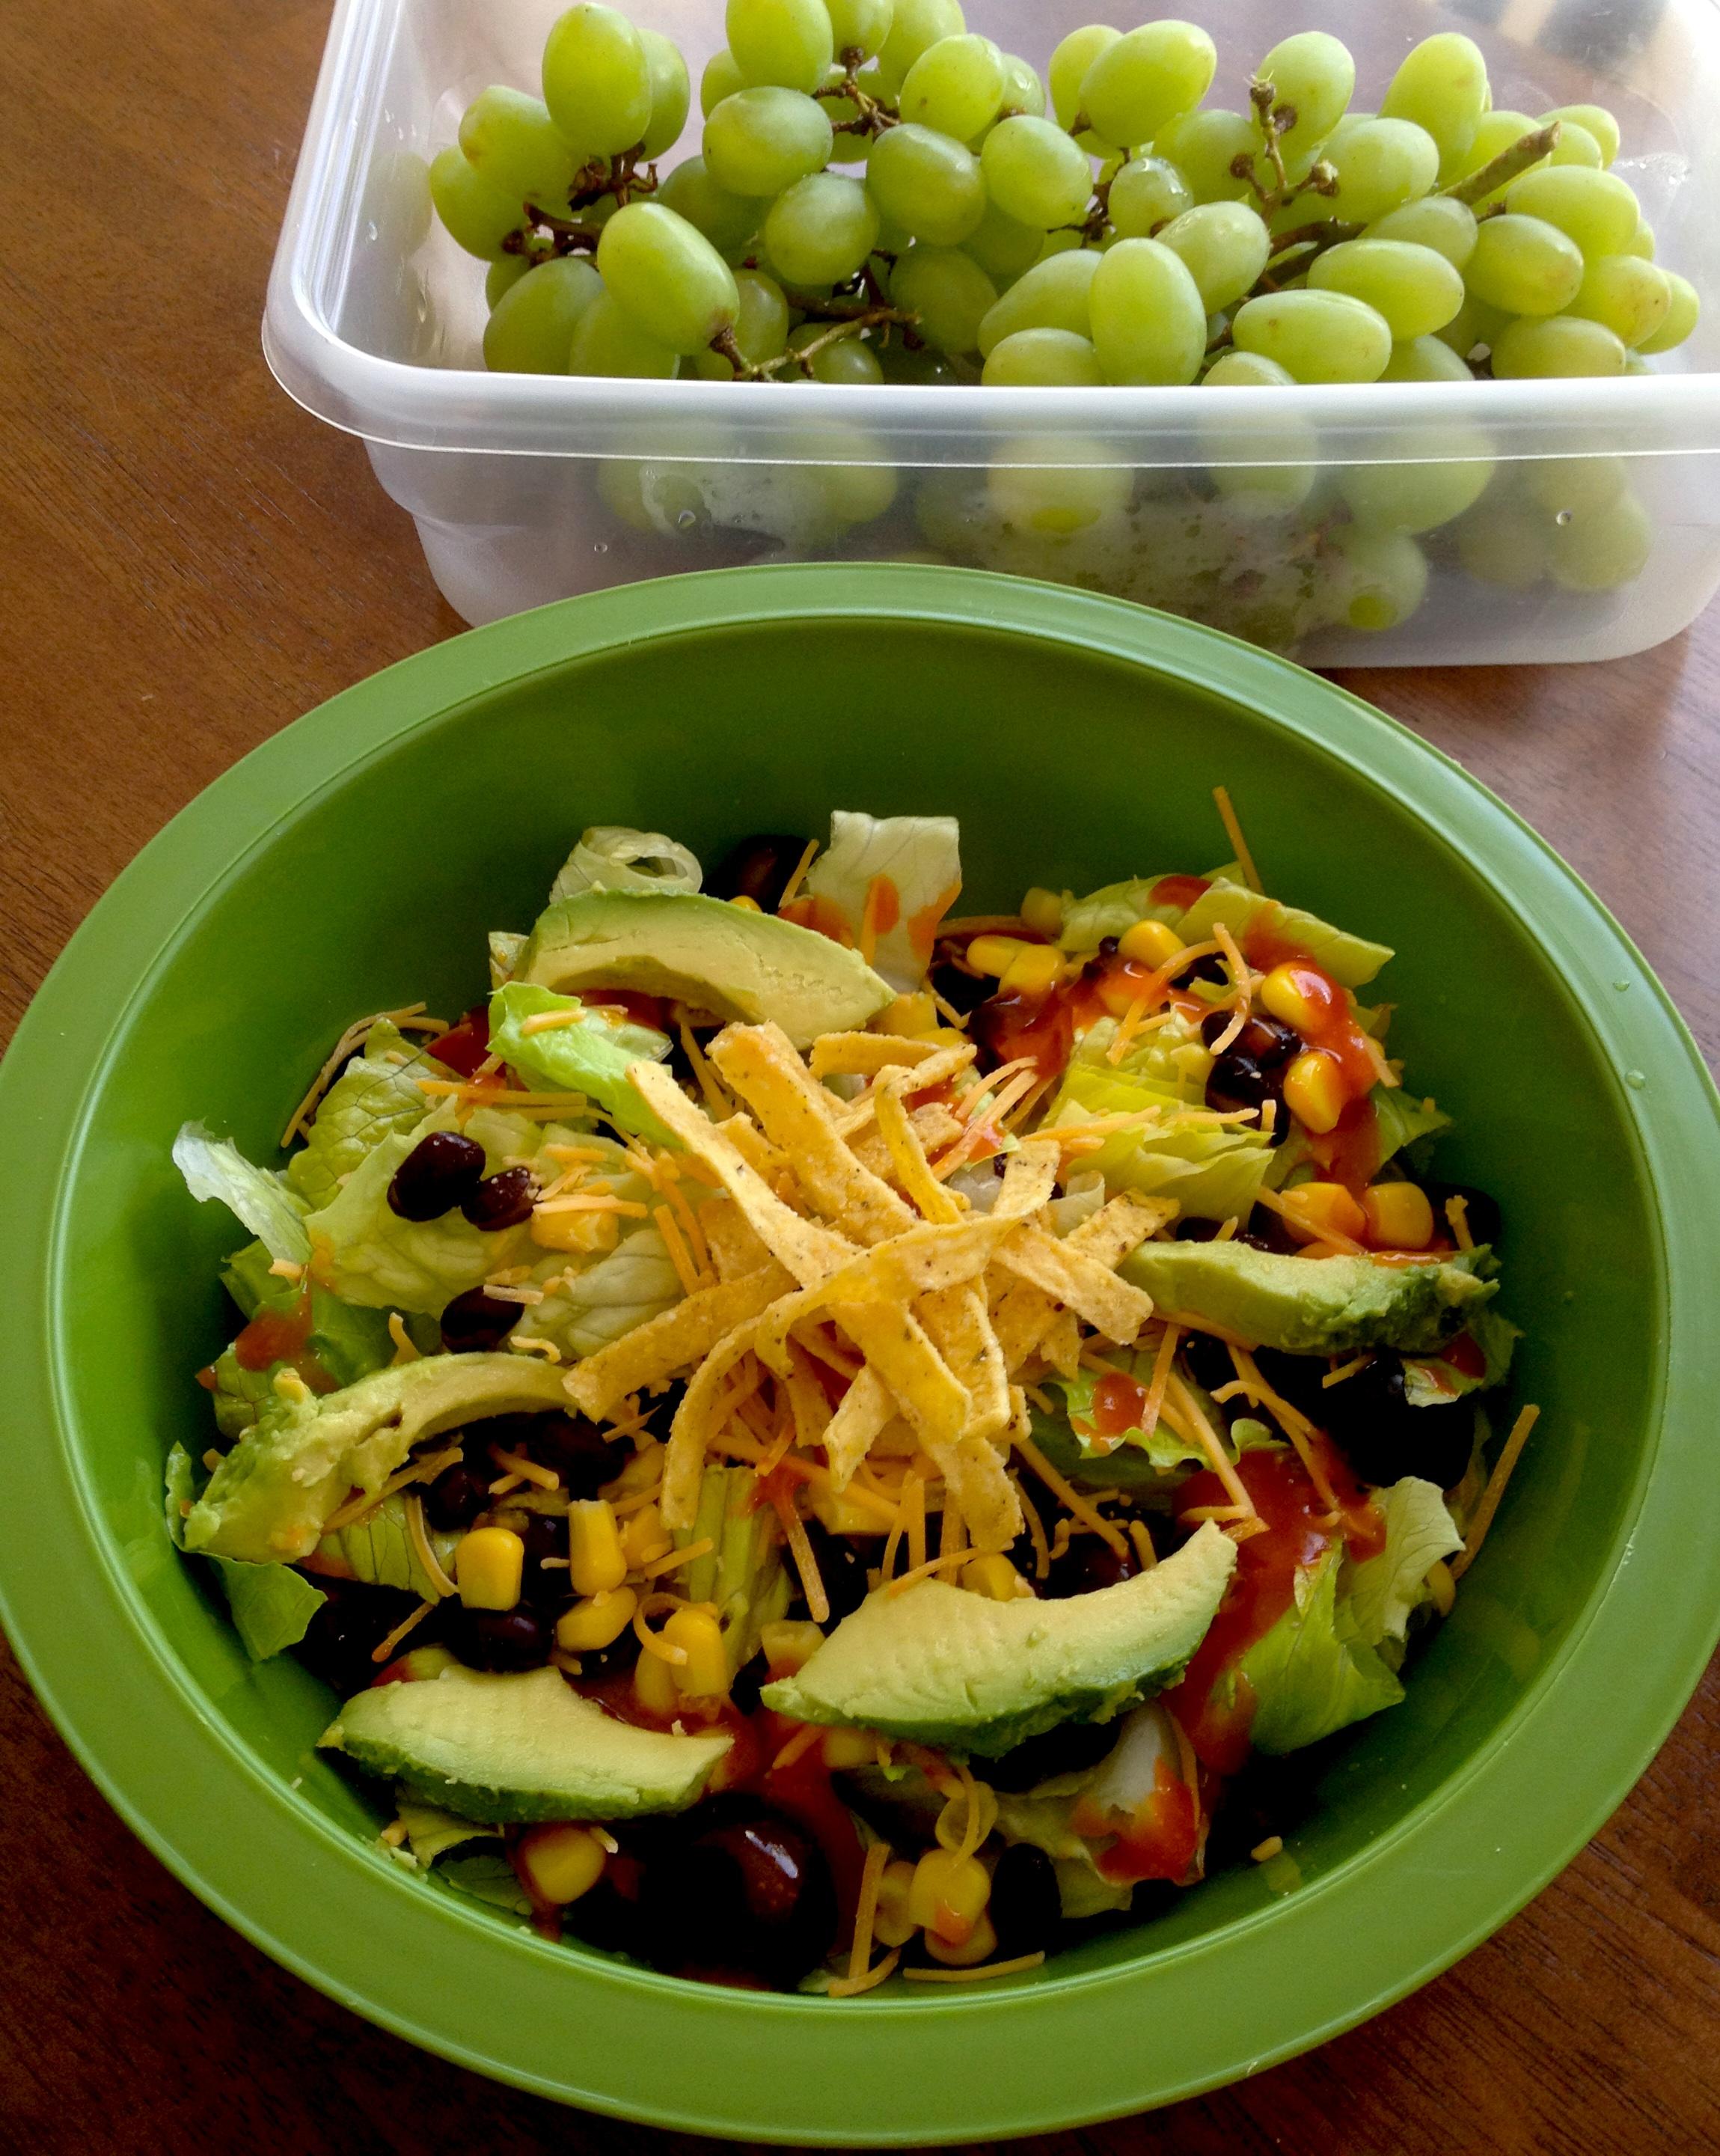 Cape Cod Chopped Salad Healthy Eating Made Simple Homemade Taco Salad